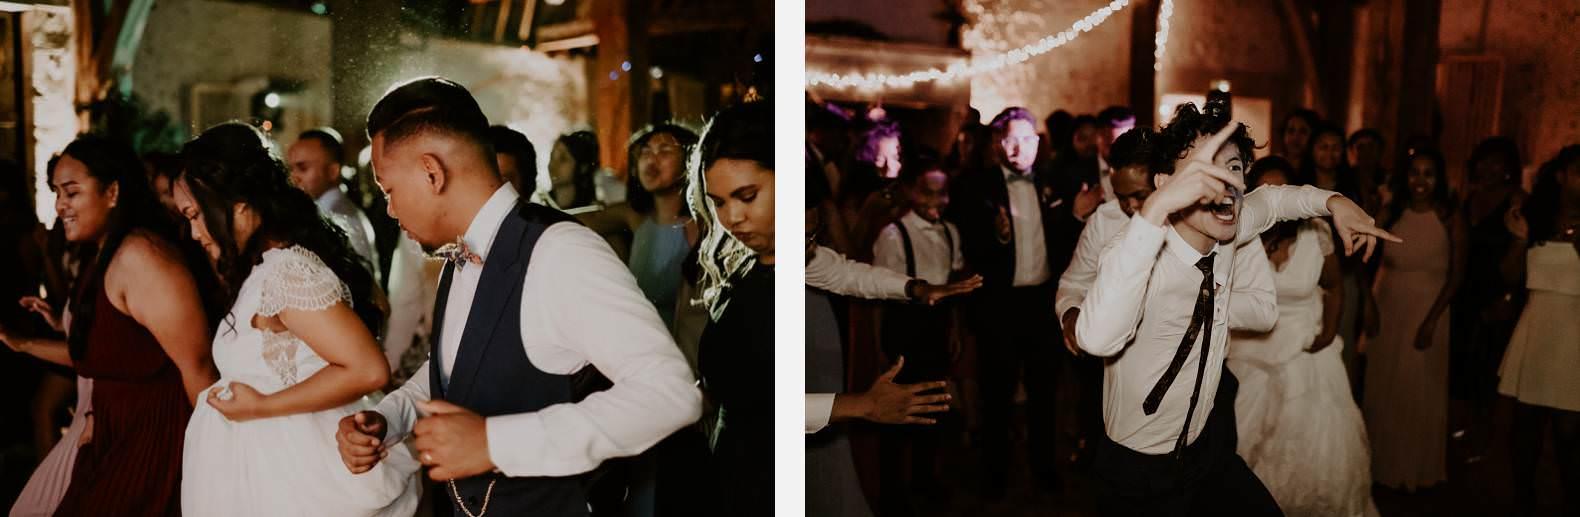 mariage manoir de corny photographe bel esprit 0071 1